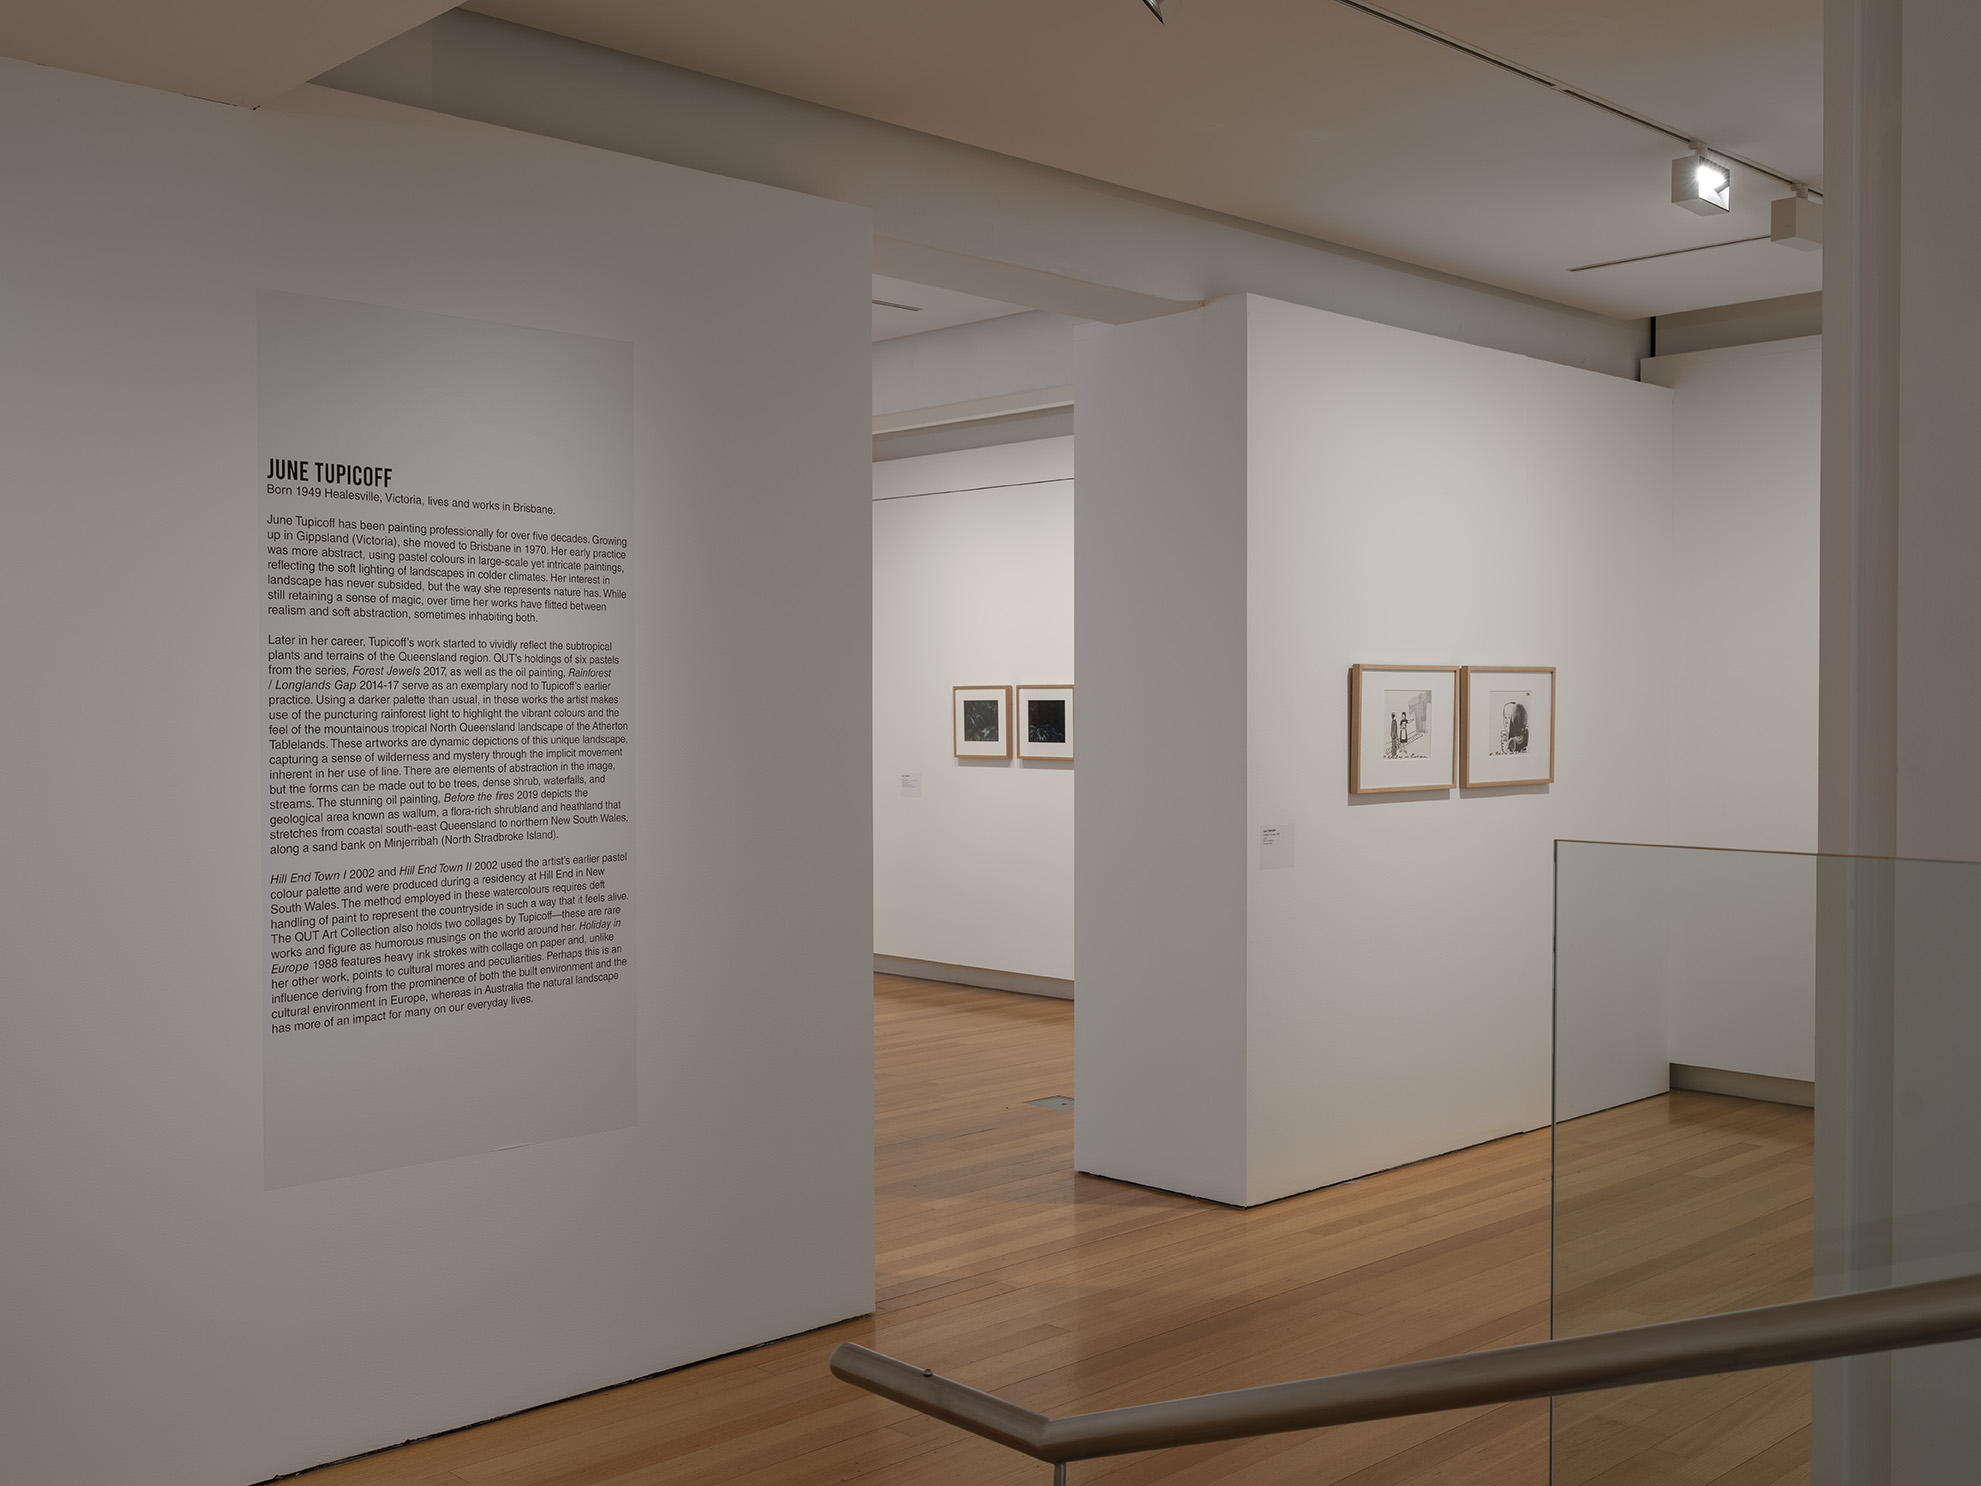 Installation view of 'Odd Bedfellows' (29 August - 8 November 2020), QUT Art Museum. Photo by Carl Warner.